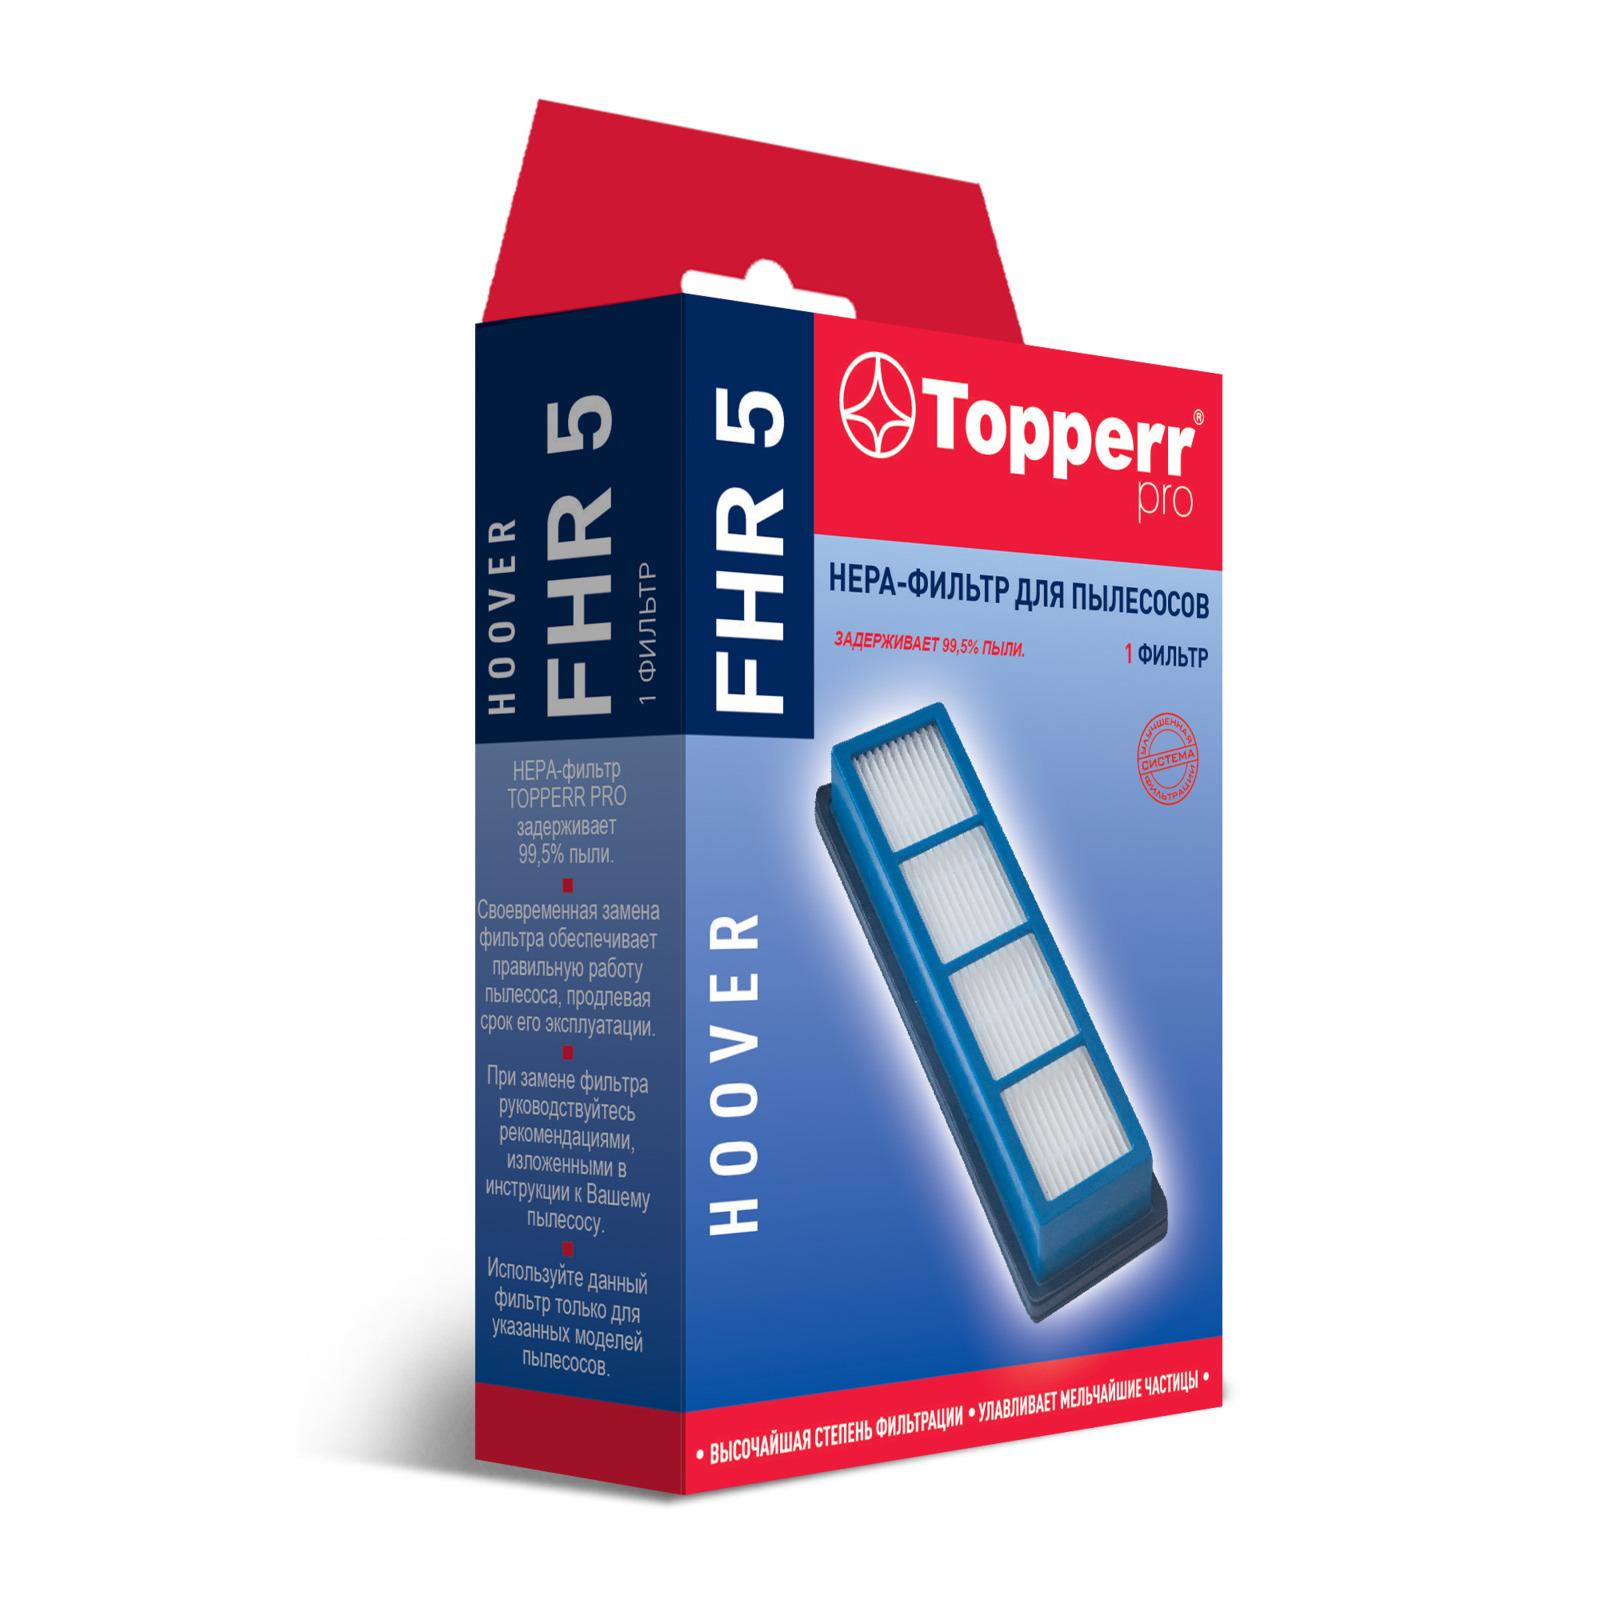 HEPA-фильтр Topperr Pro 1167 FHR 5, для пылесоса Hoover Hydropower